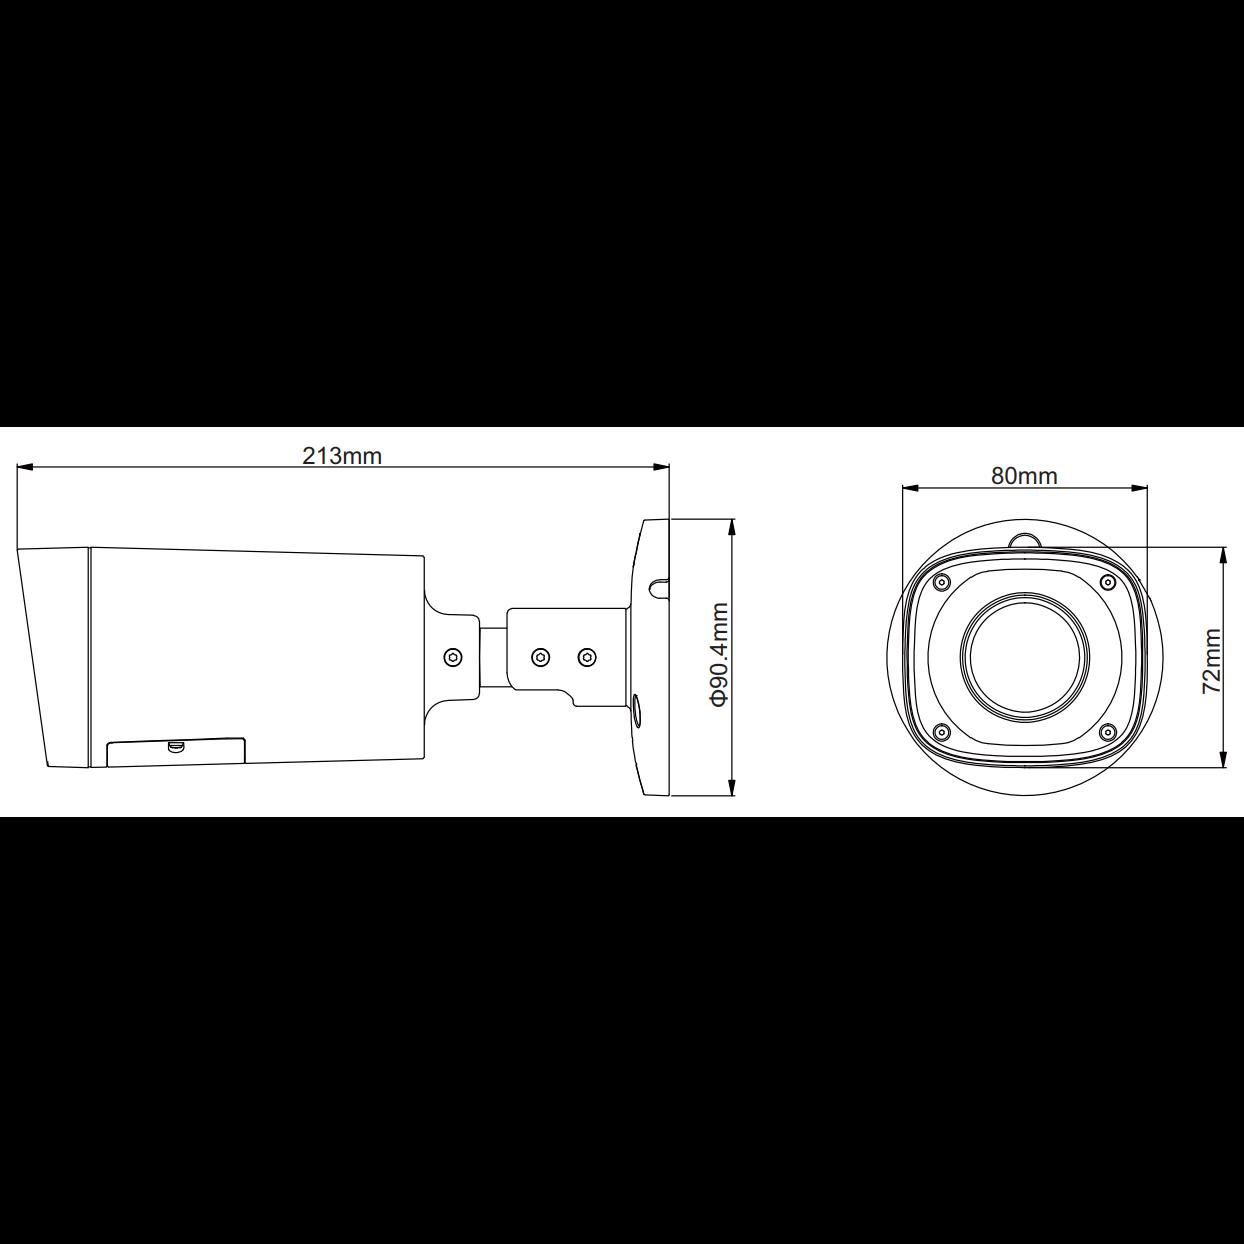 HDCVI уличная камера Dahua DH-HAC-HFW1200RP-VF 1080p, 2.7-12мм, ИК до 30м, 12В